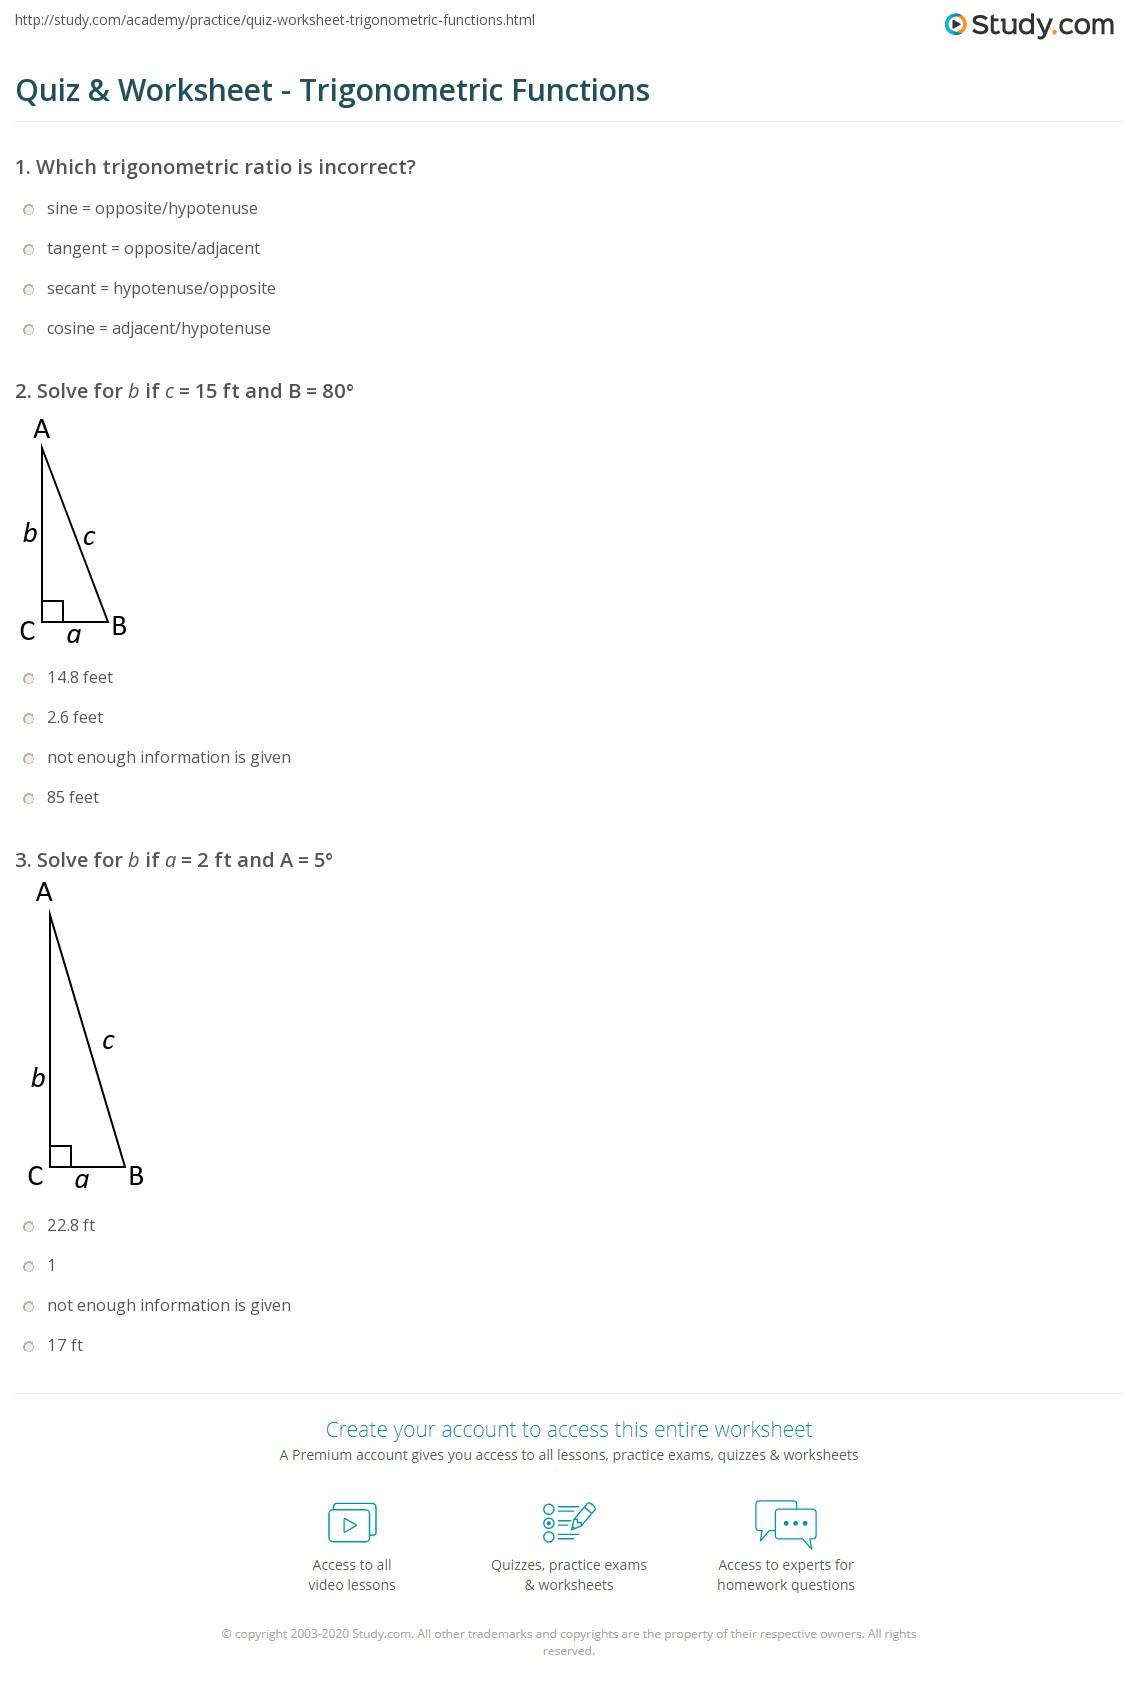 Graphing Trig Functions Practice Worksheet Quiz & Worksheet Trigonometric Functions